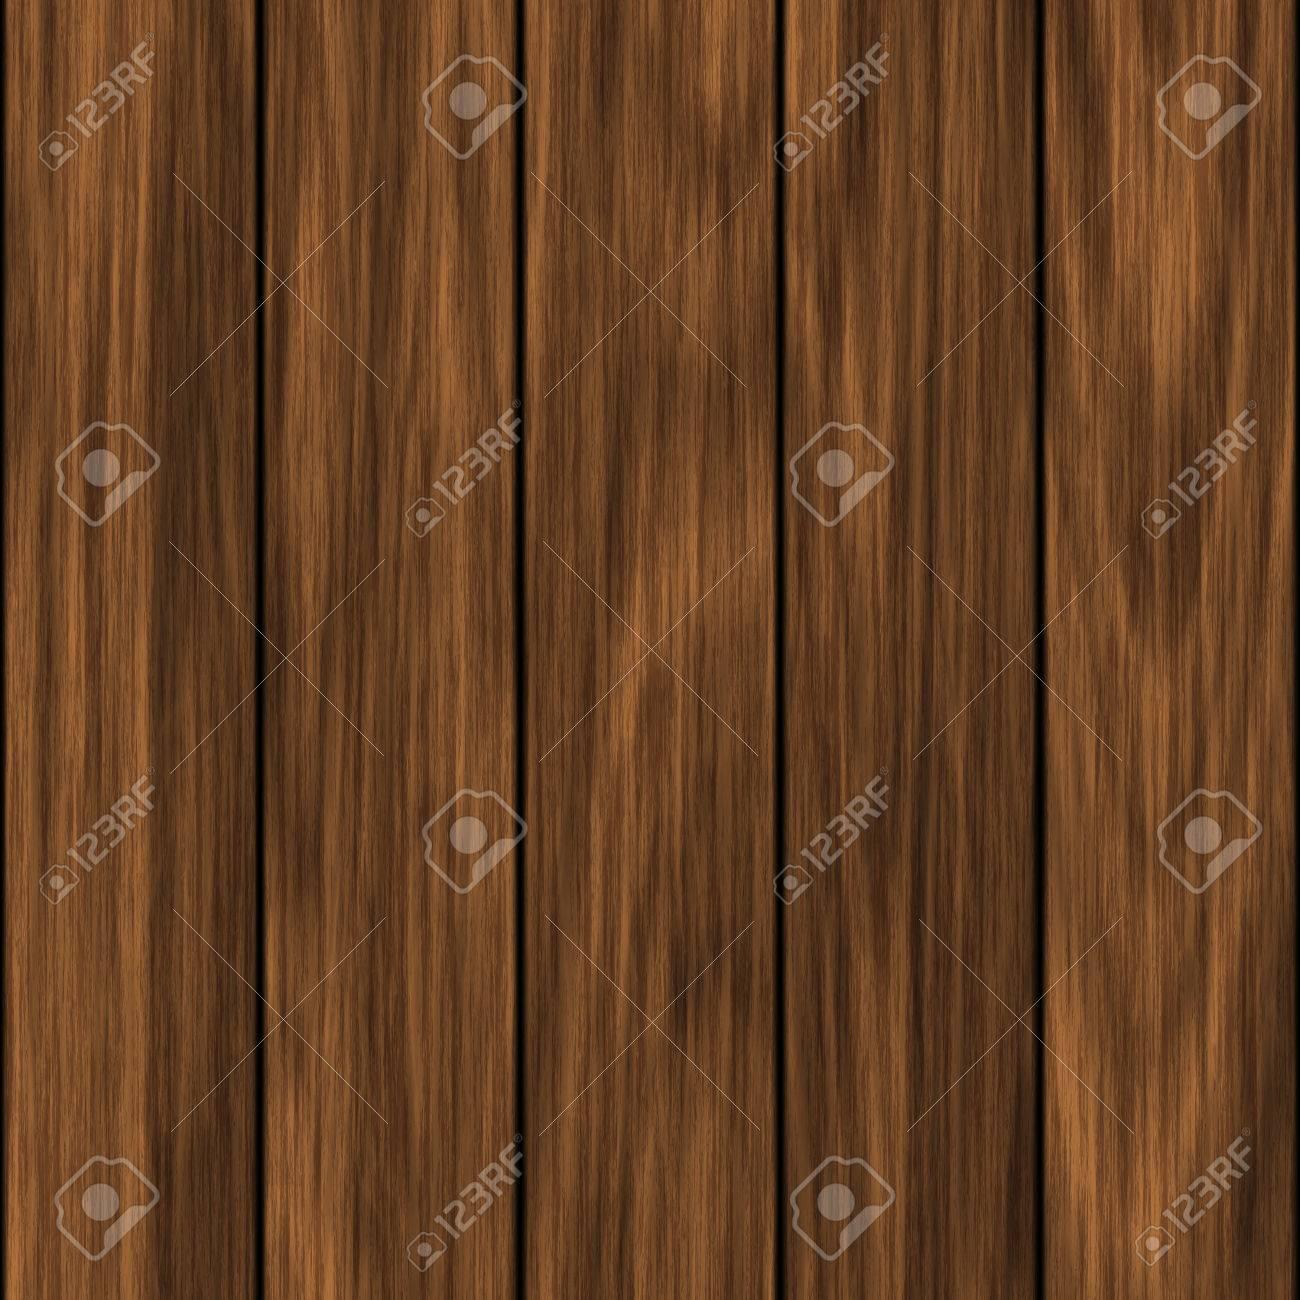 High Quality High Resolution Seamless Wood Texture Dark Hardwood